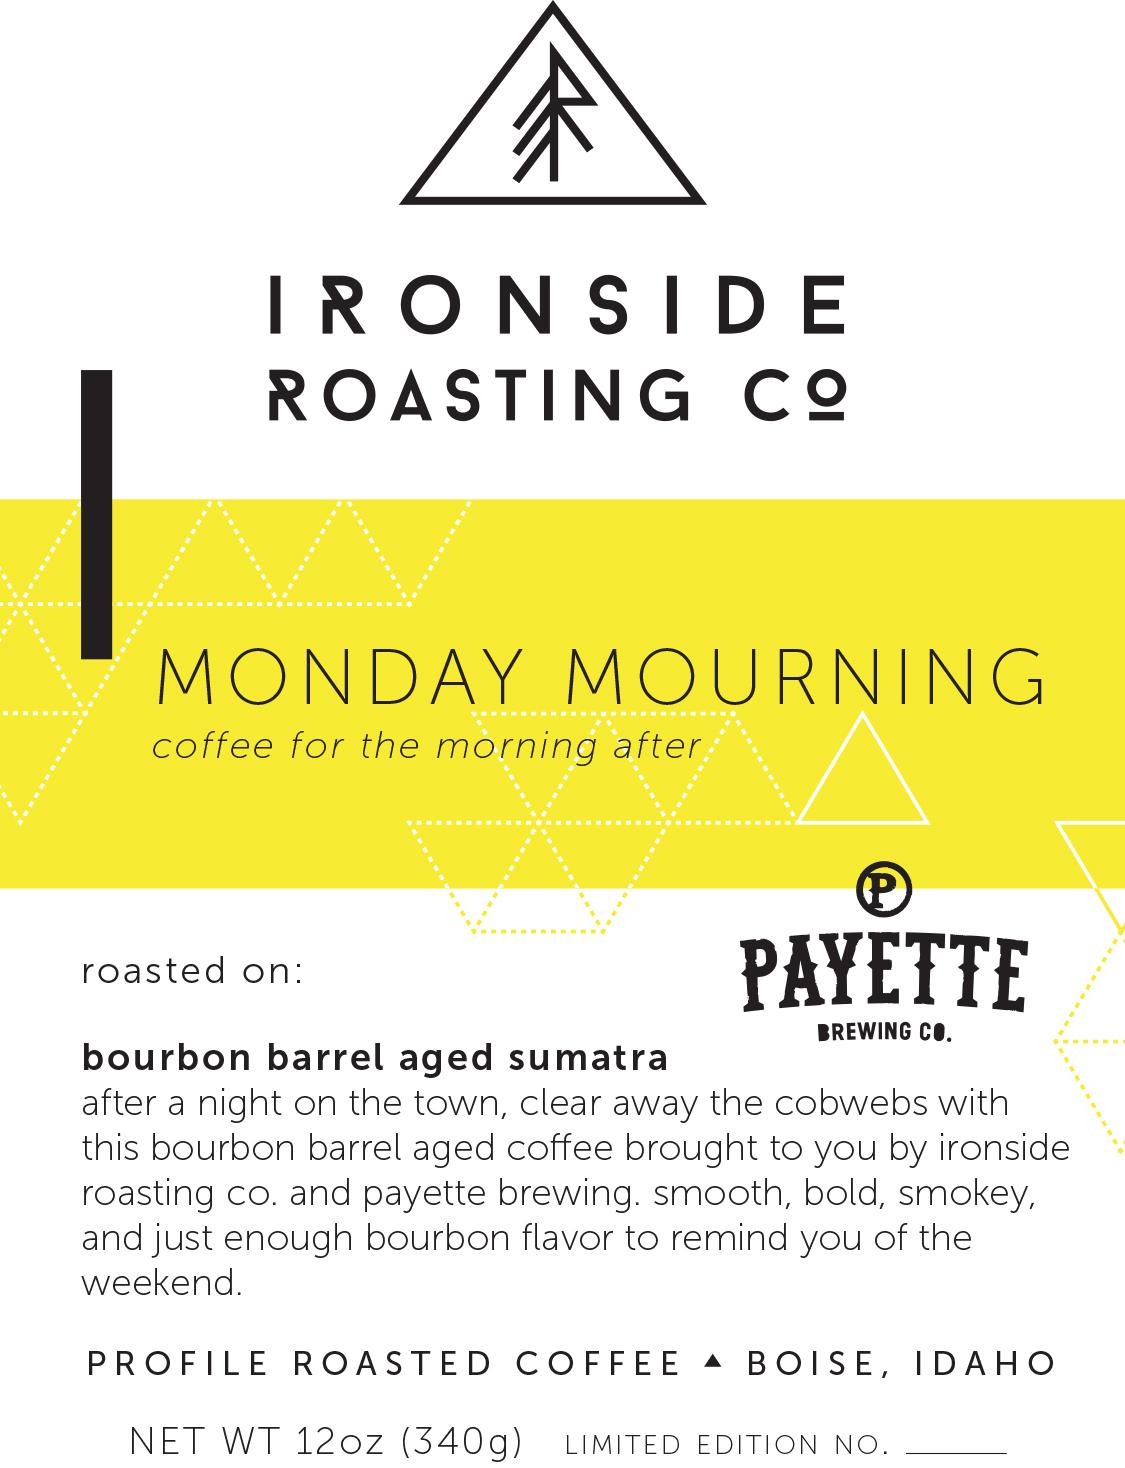 Ironside_Monday_Mourning_Labels.jpg